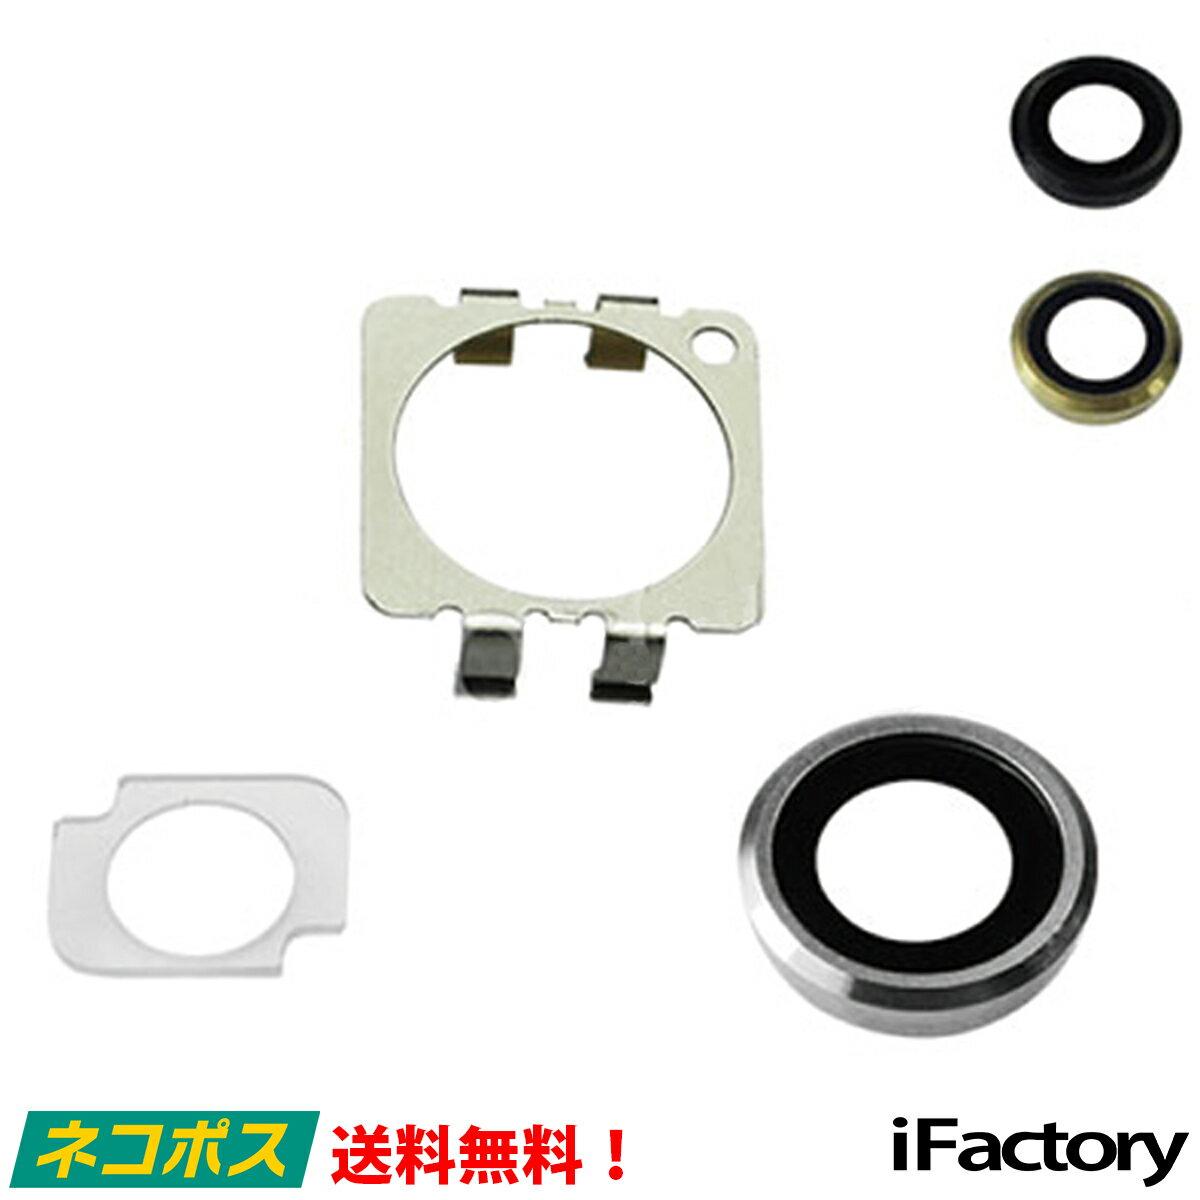 iPhone6/6s バックカメラレンズカバー+ディフューザーレンズ 修理 交換用リペアパーツ